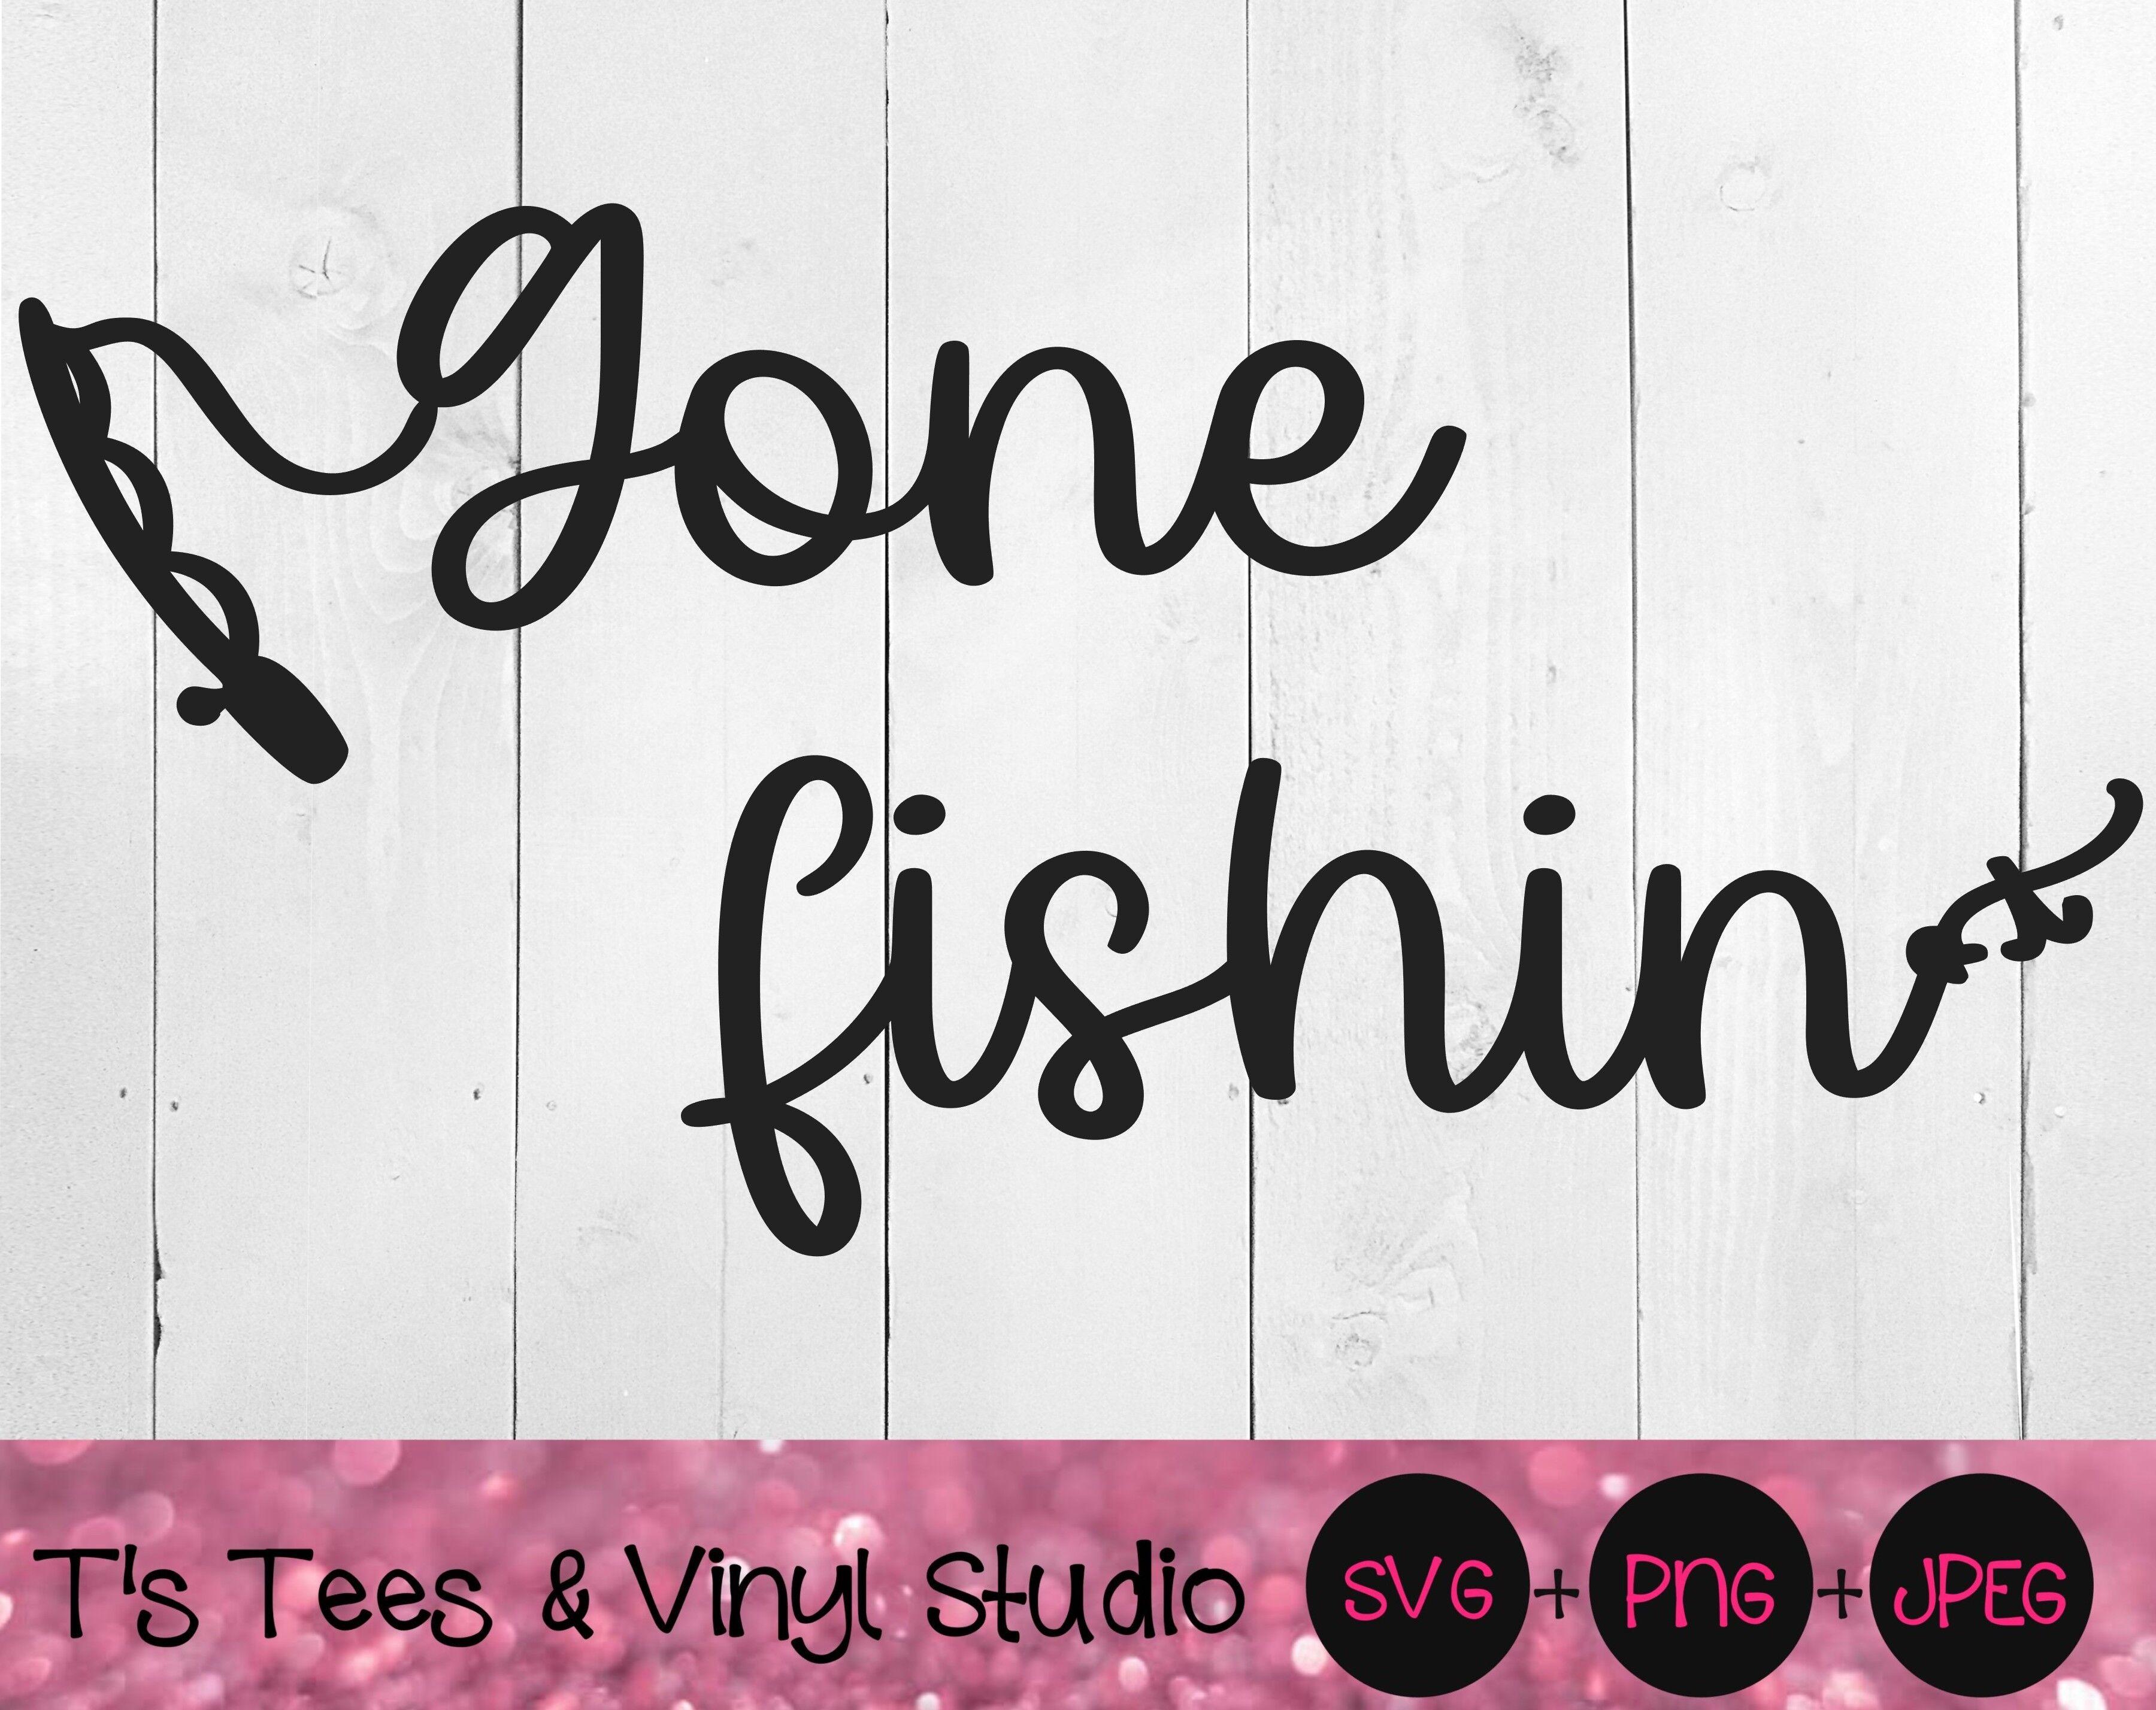 Download Gone Fishin Svg Gone Fishing Svg Fishin Svg Fishing Svg Fish Svg By T S Tees Vinyl Studio Thehungryjpeg Com